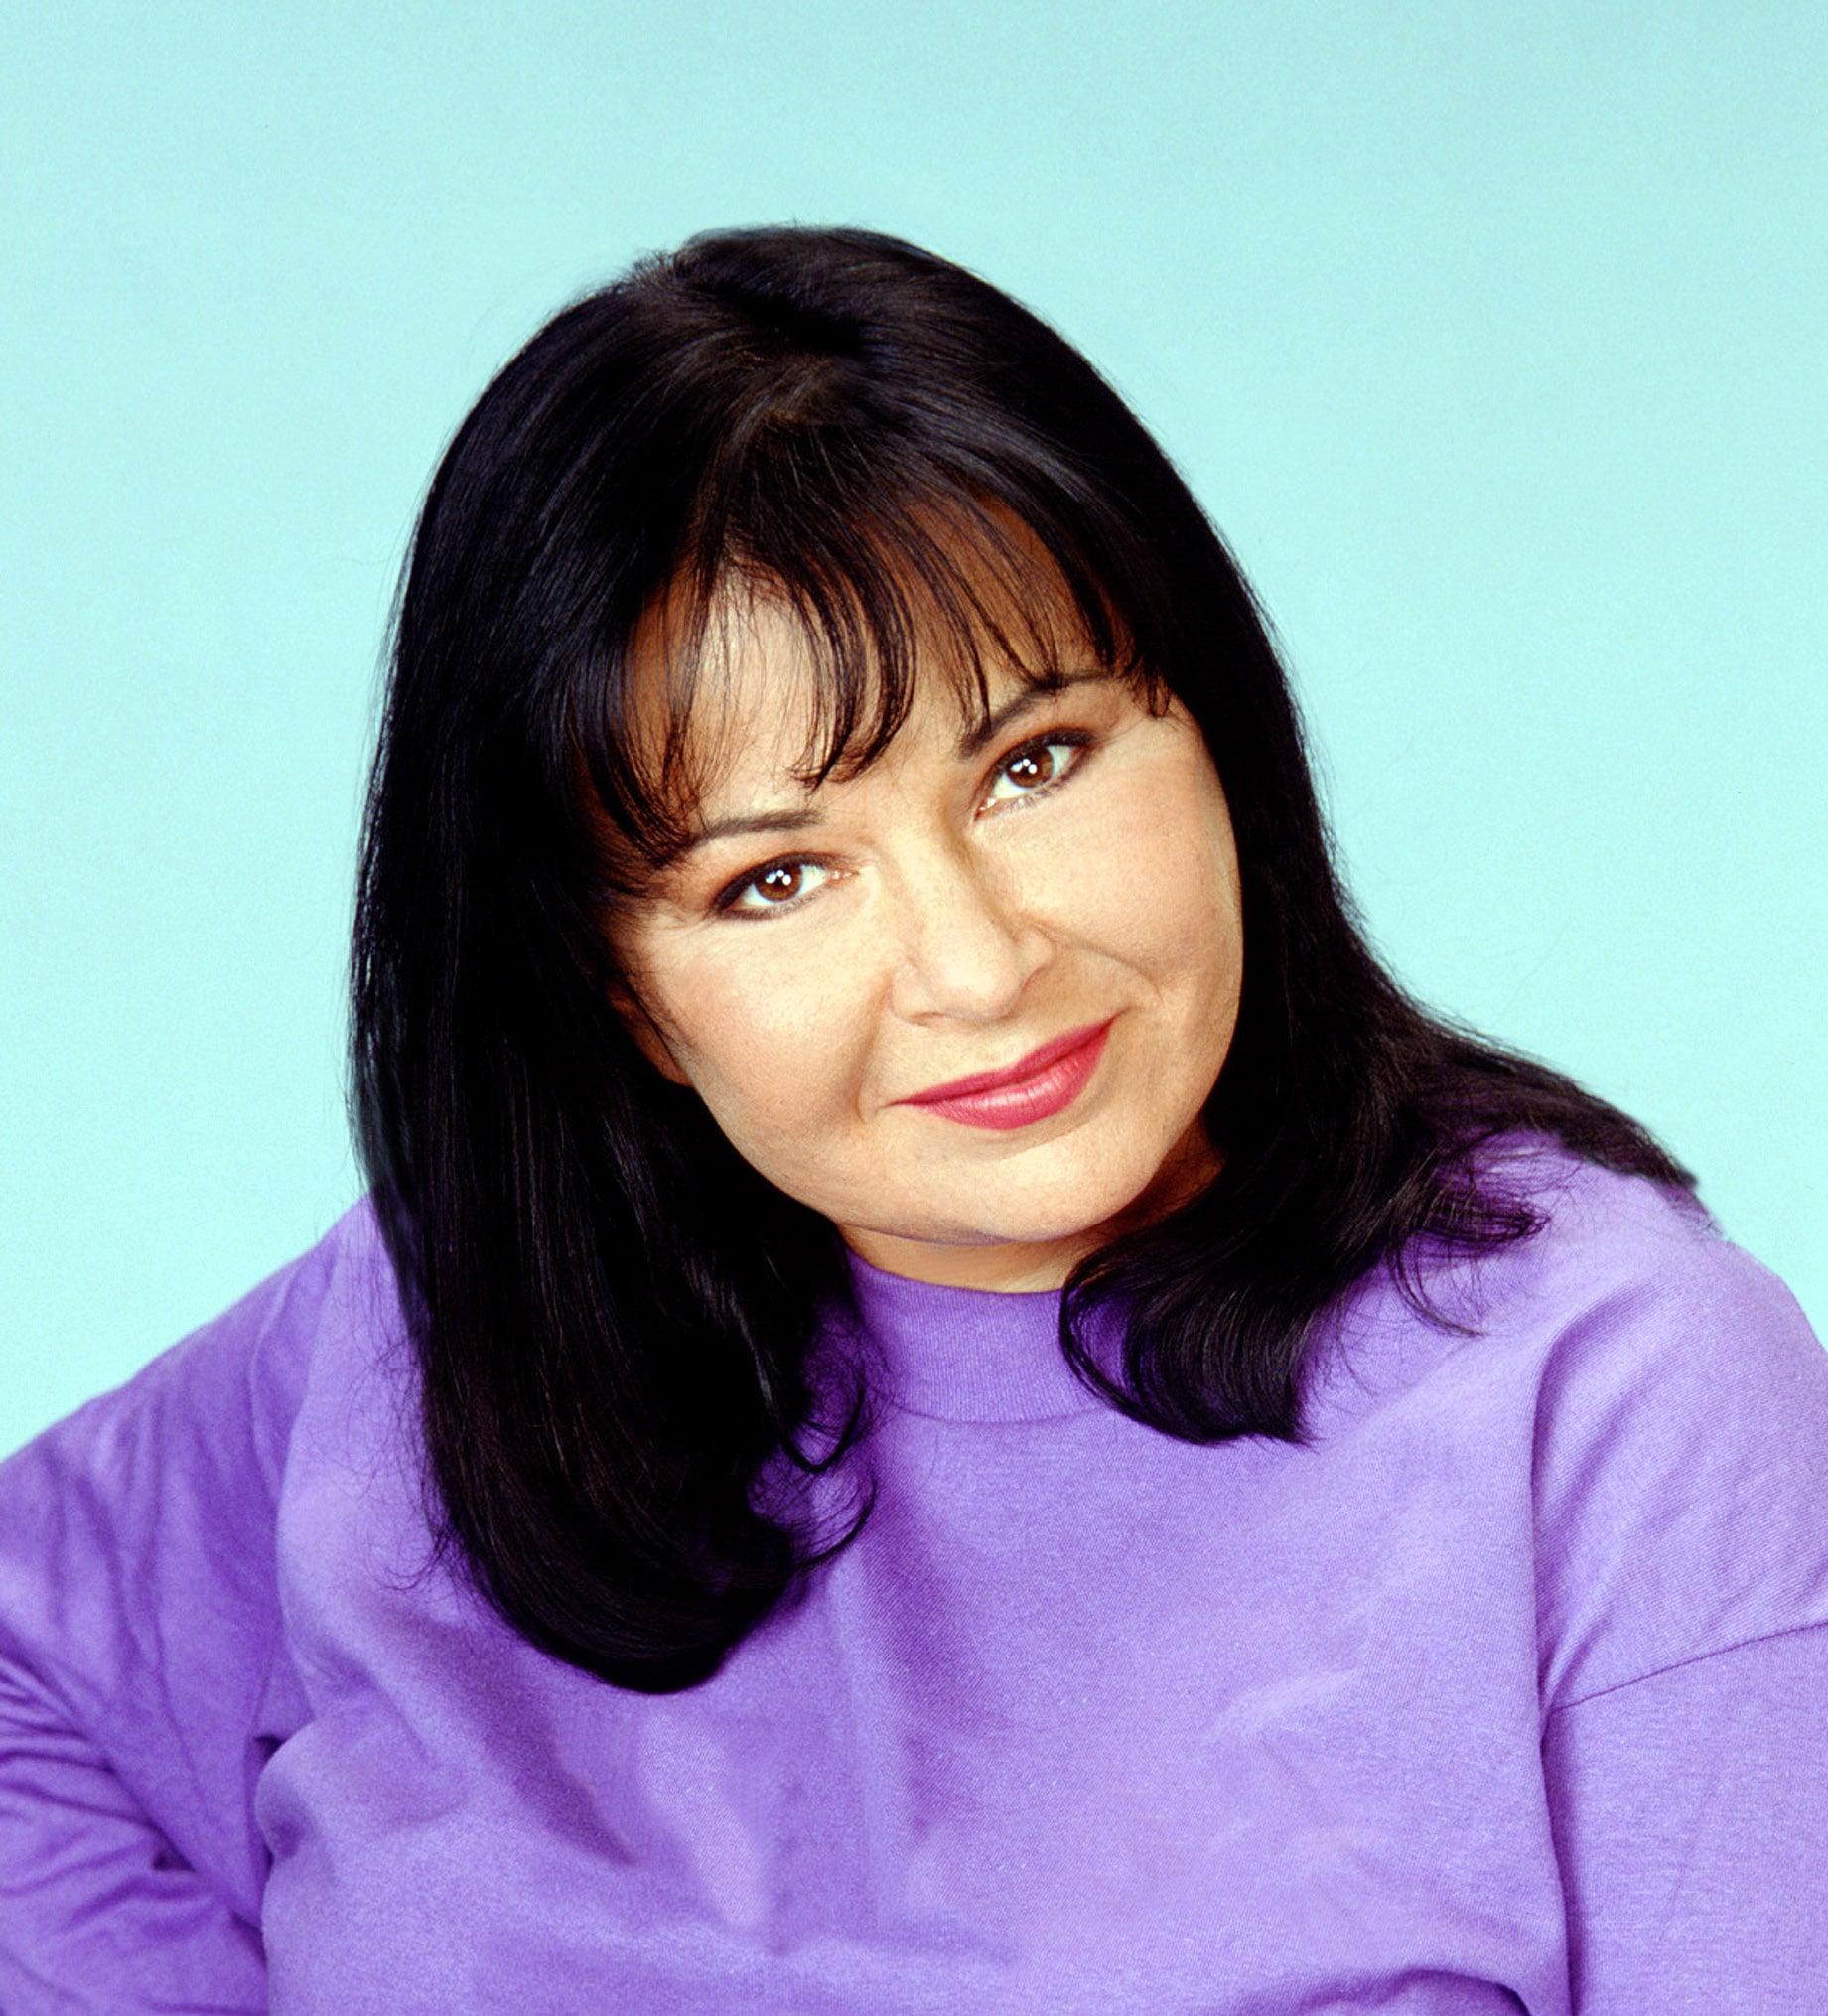 Roseanne Conner